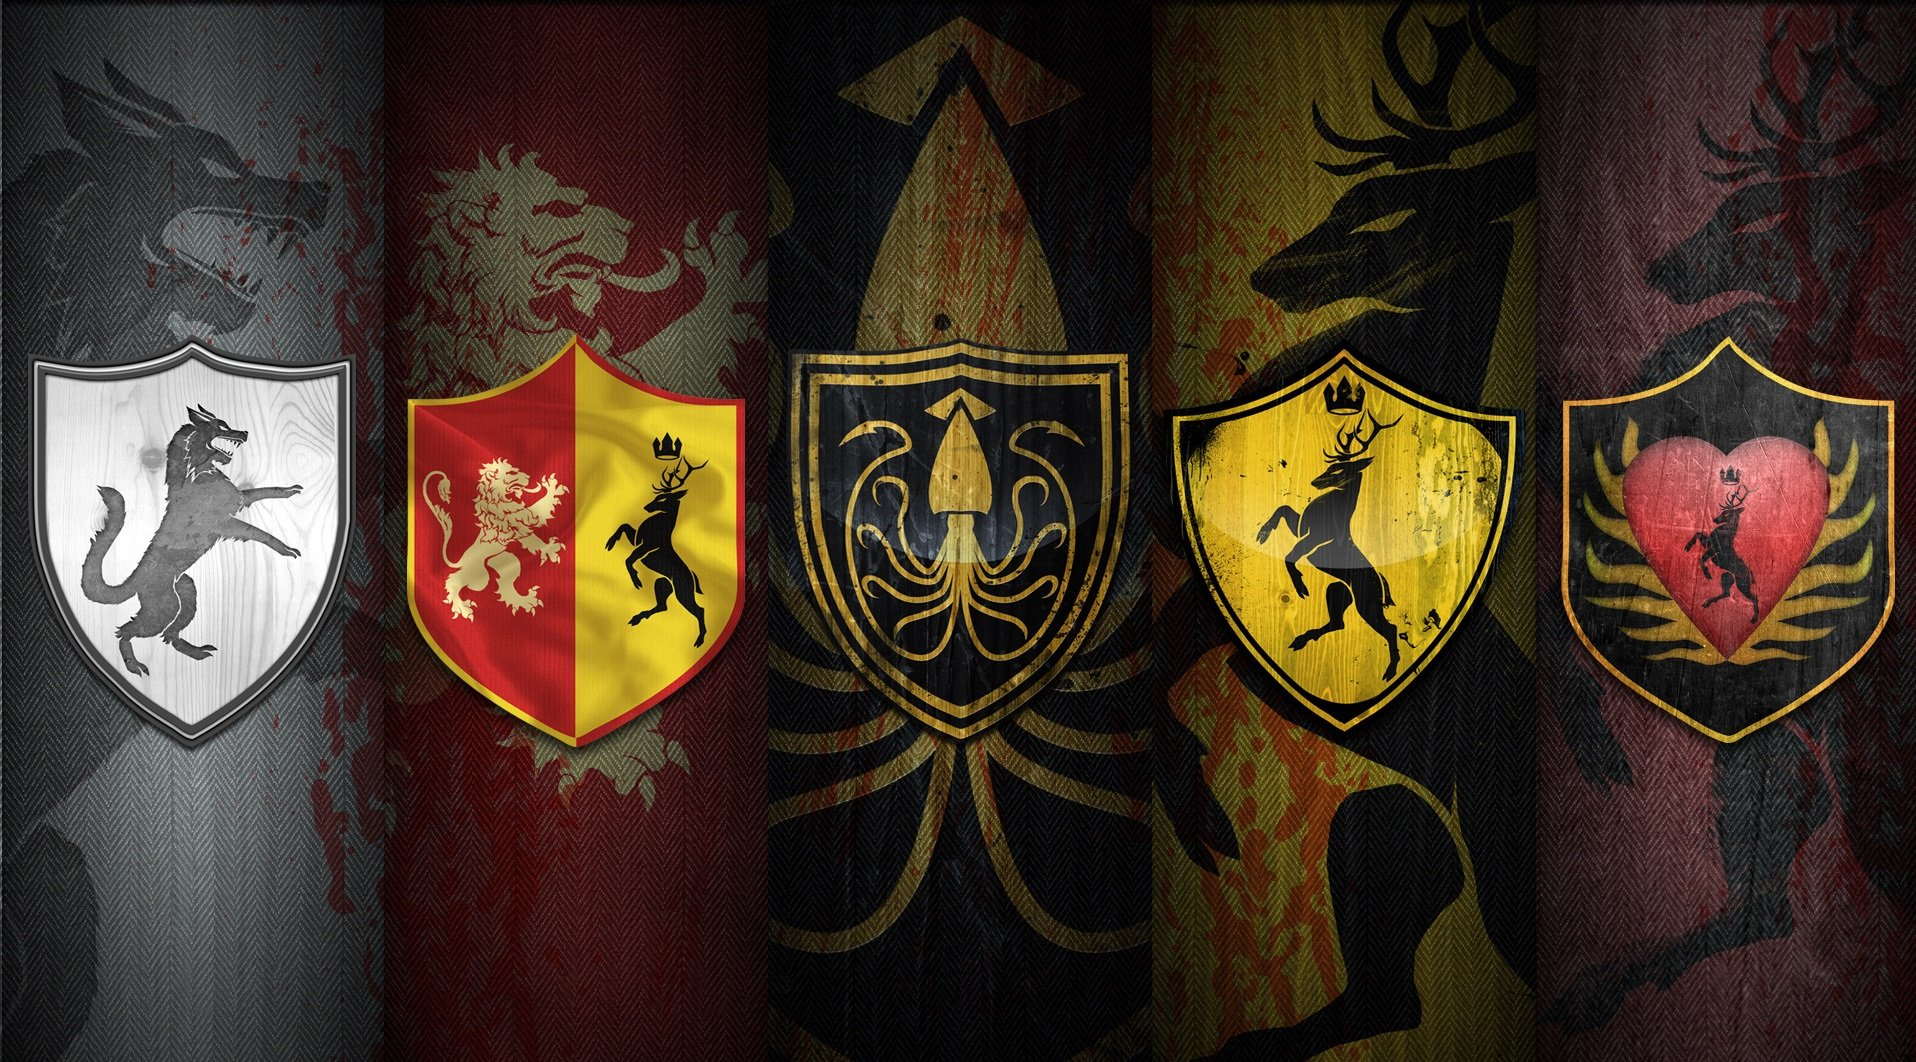 Game of Thrones (Игра престолов). - Изображение 1